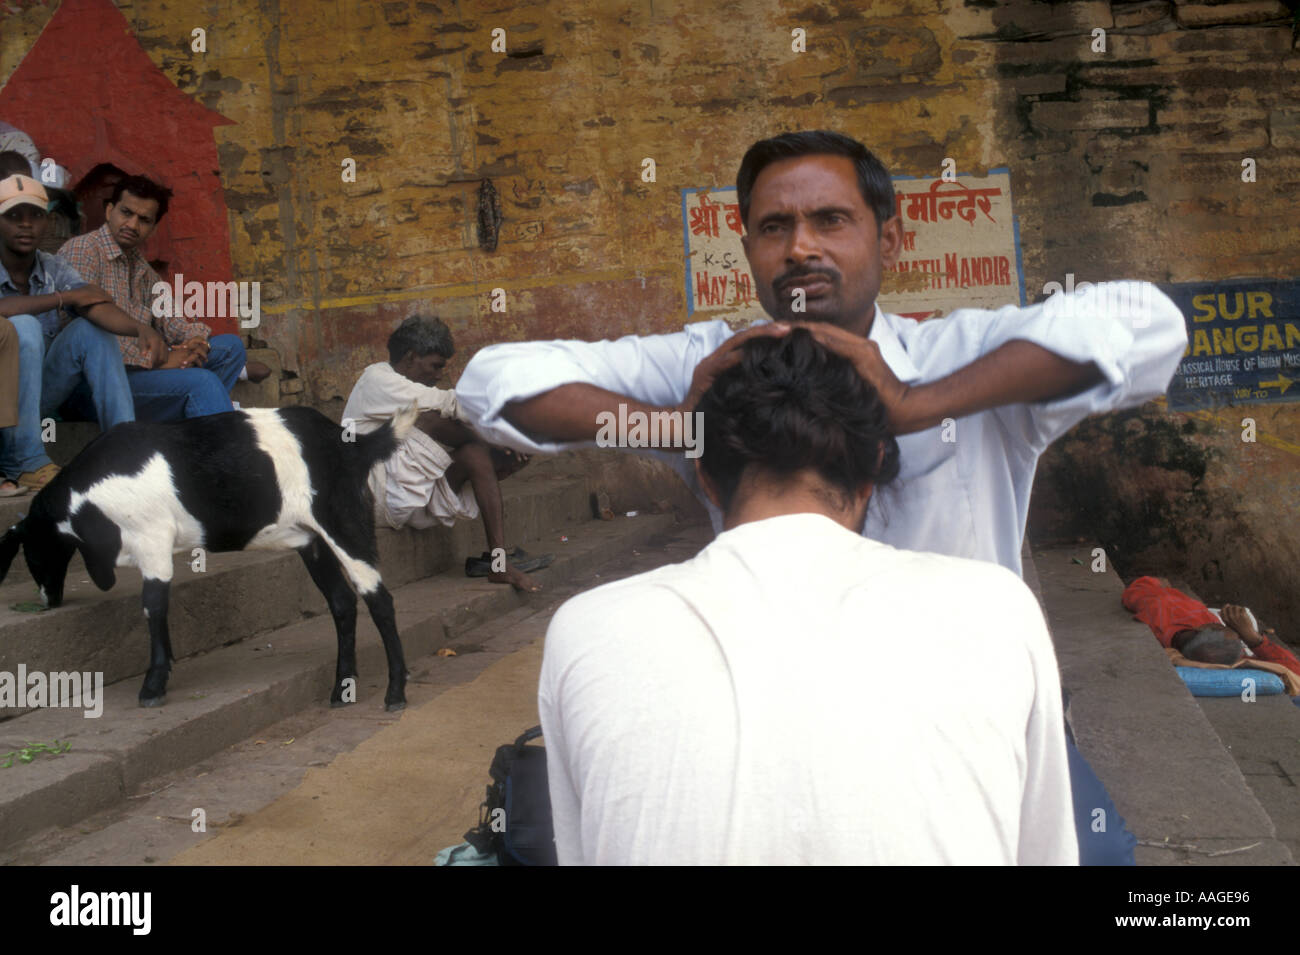 Man getting a massage at a ghat in Varanasi Uttar Pradesh India - Stock Image